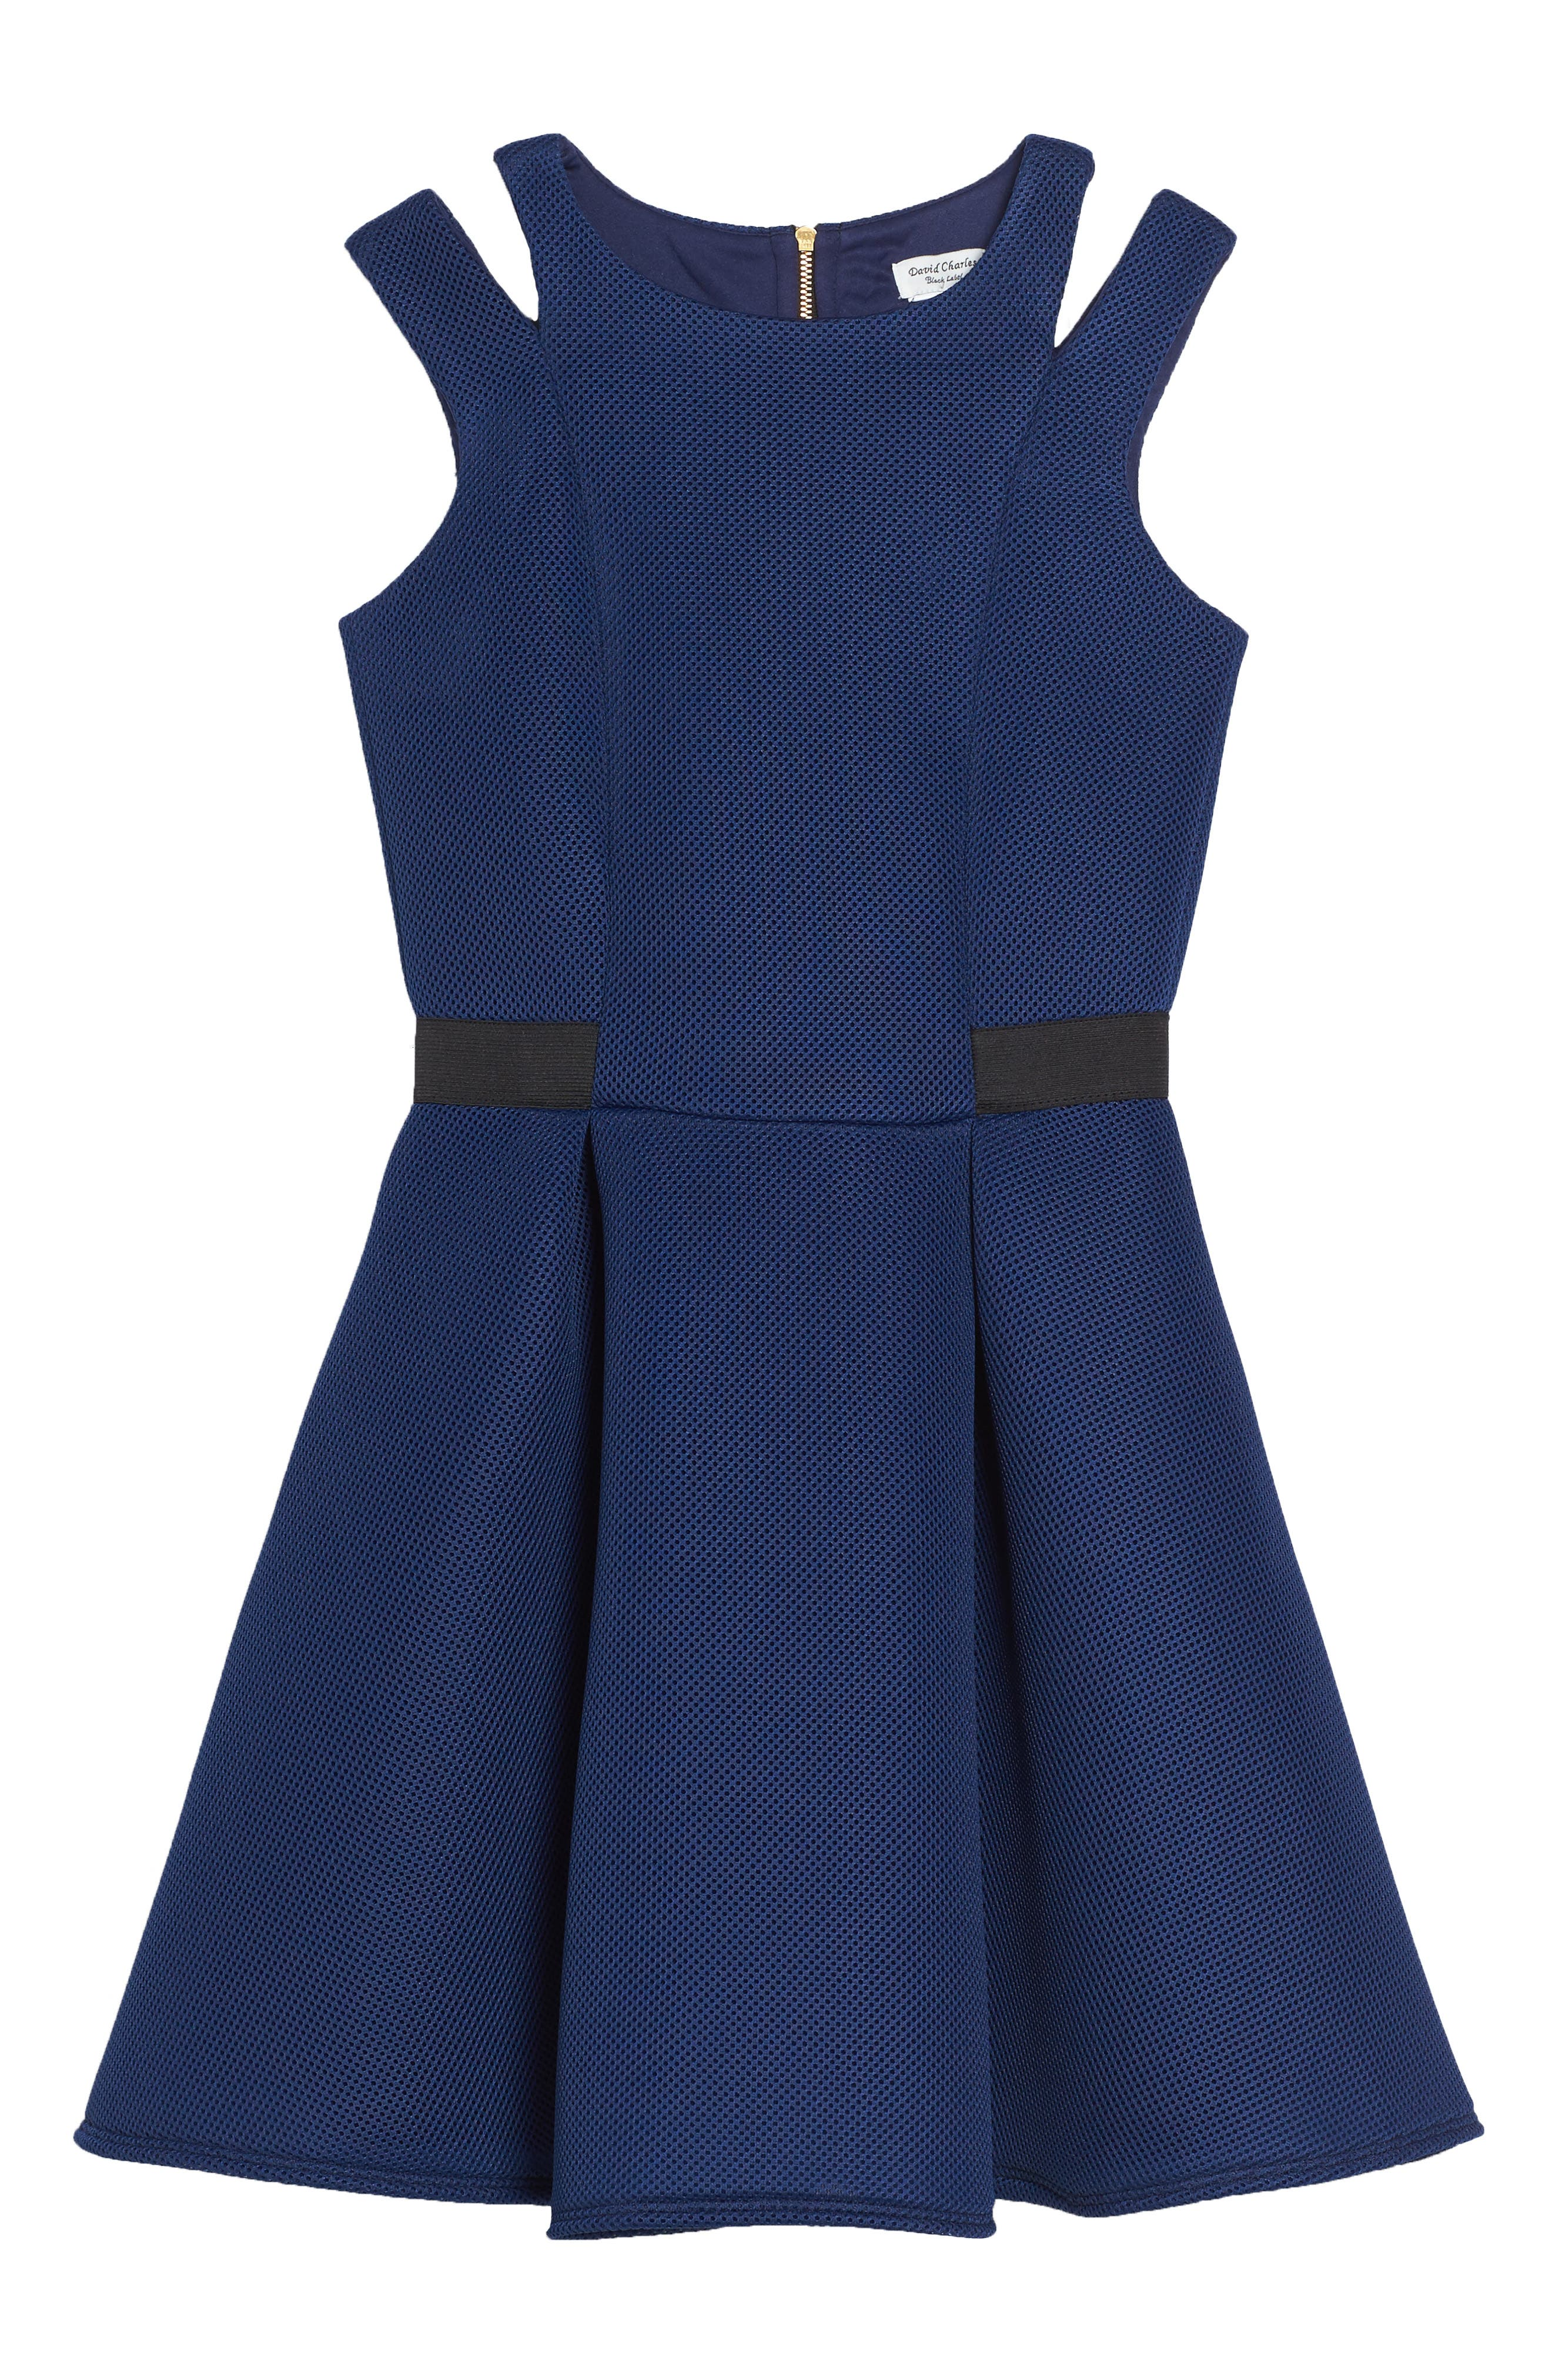 Elastic Techno Skater Dress,                         Main,                         color, 430